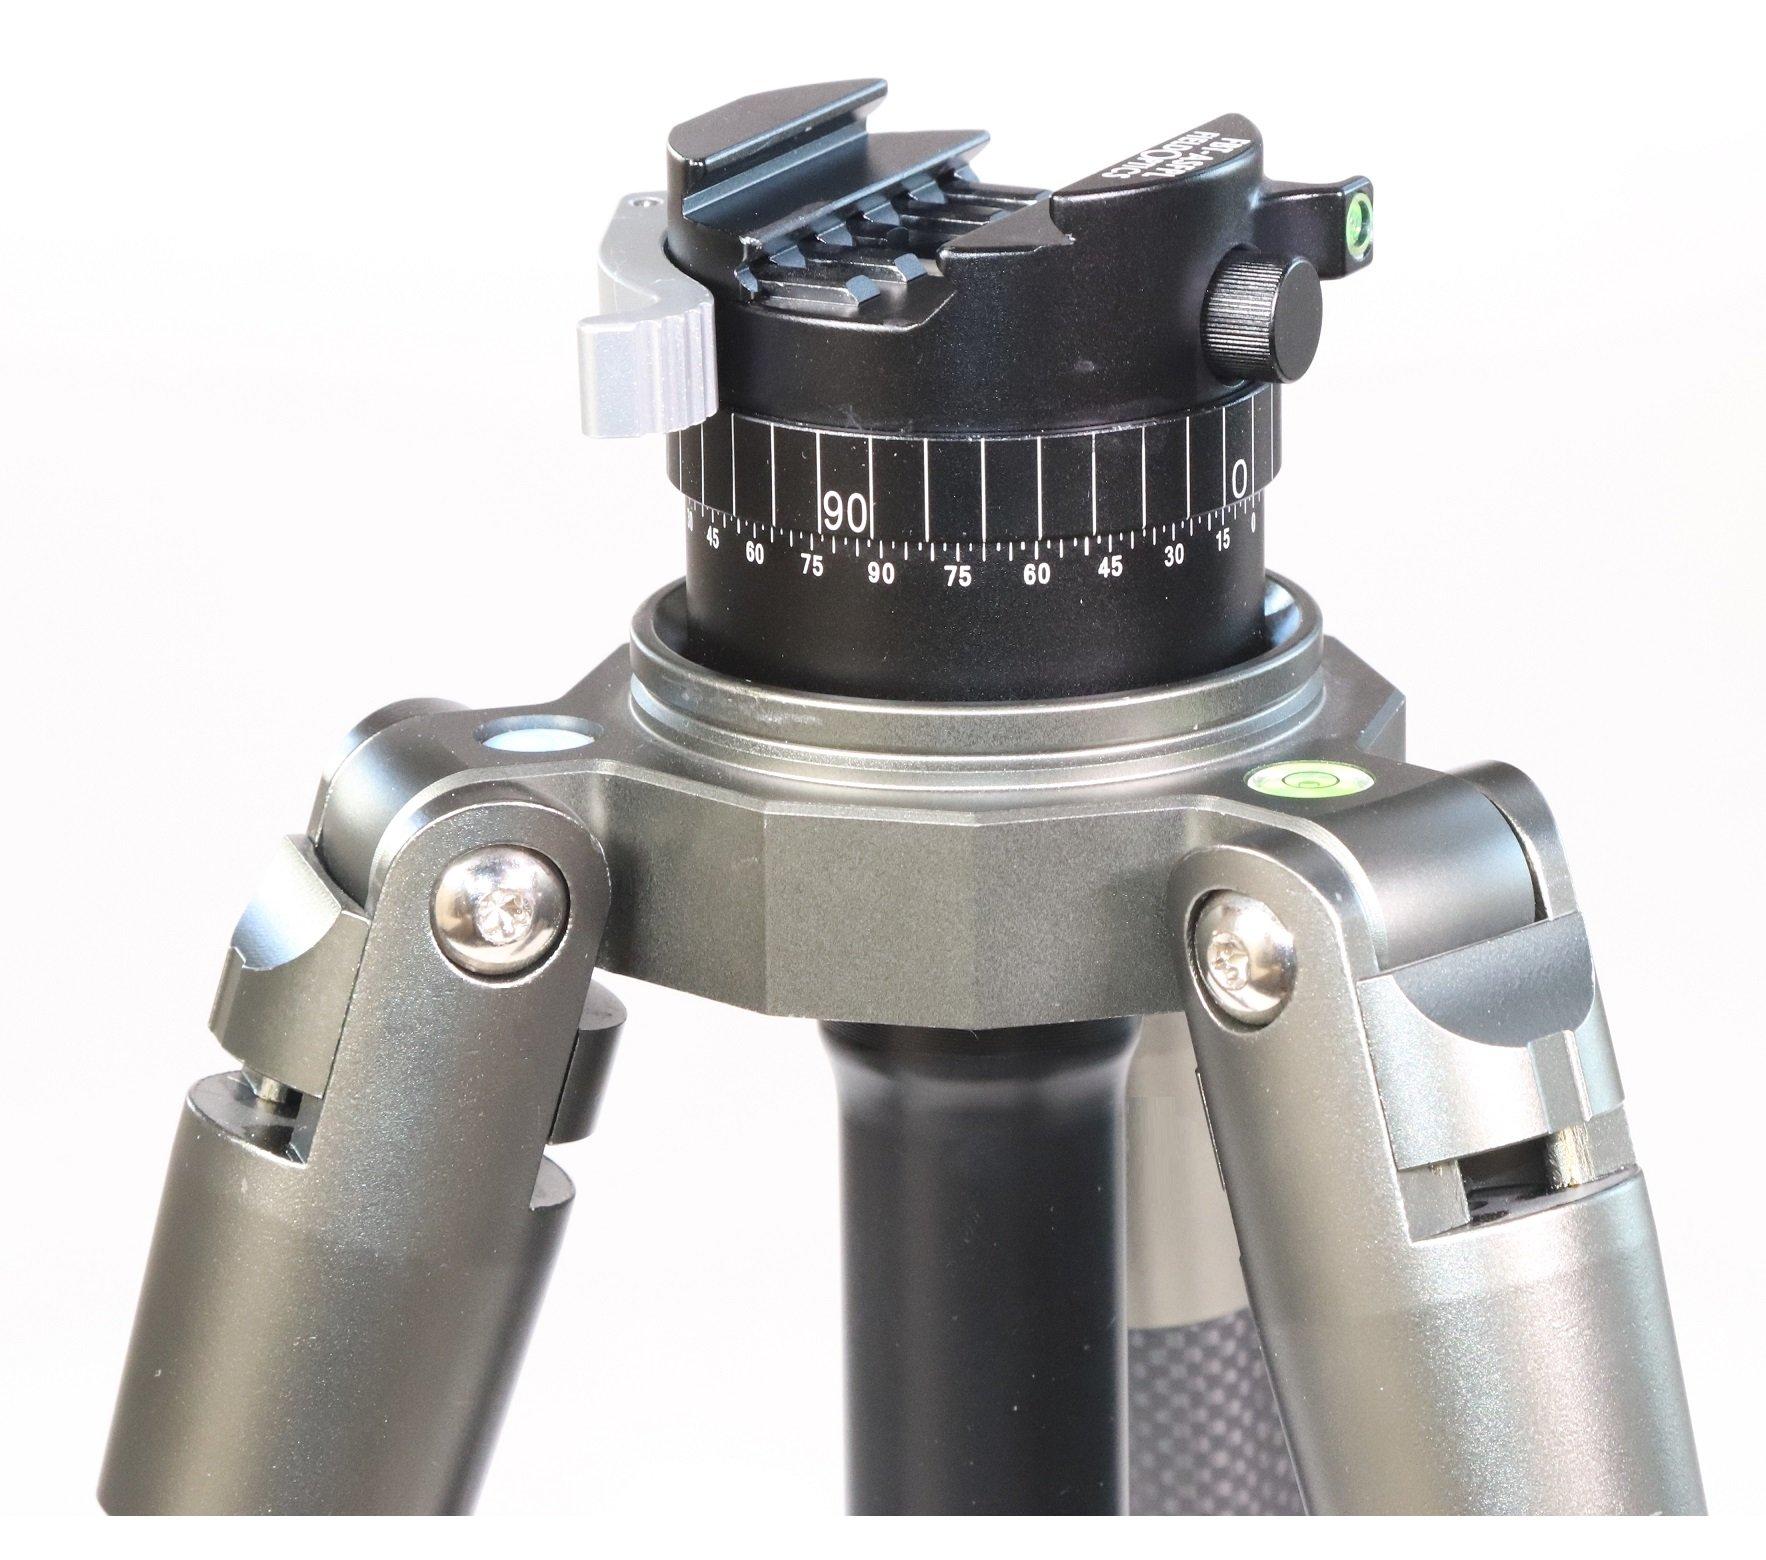 BT Precision-ASFPL Bowl Top Tripod System